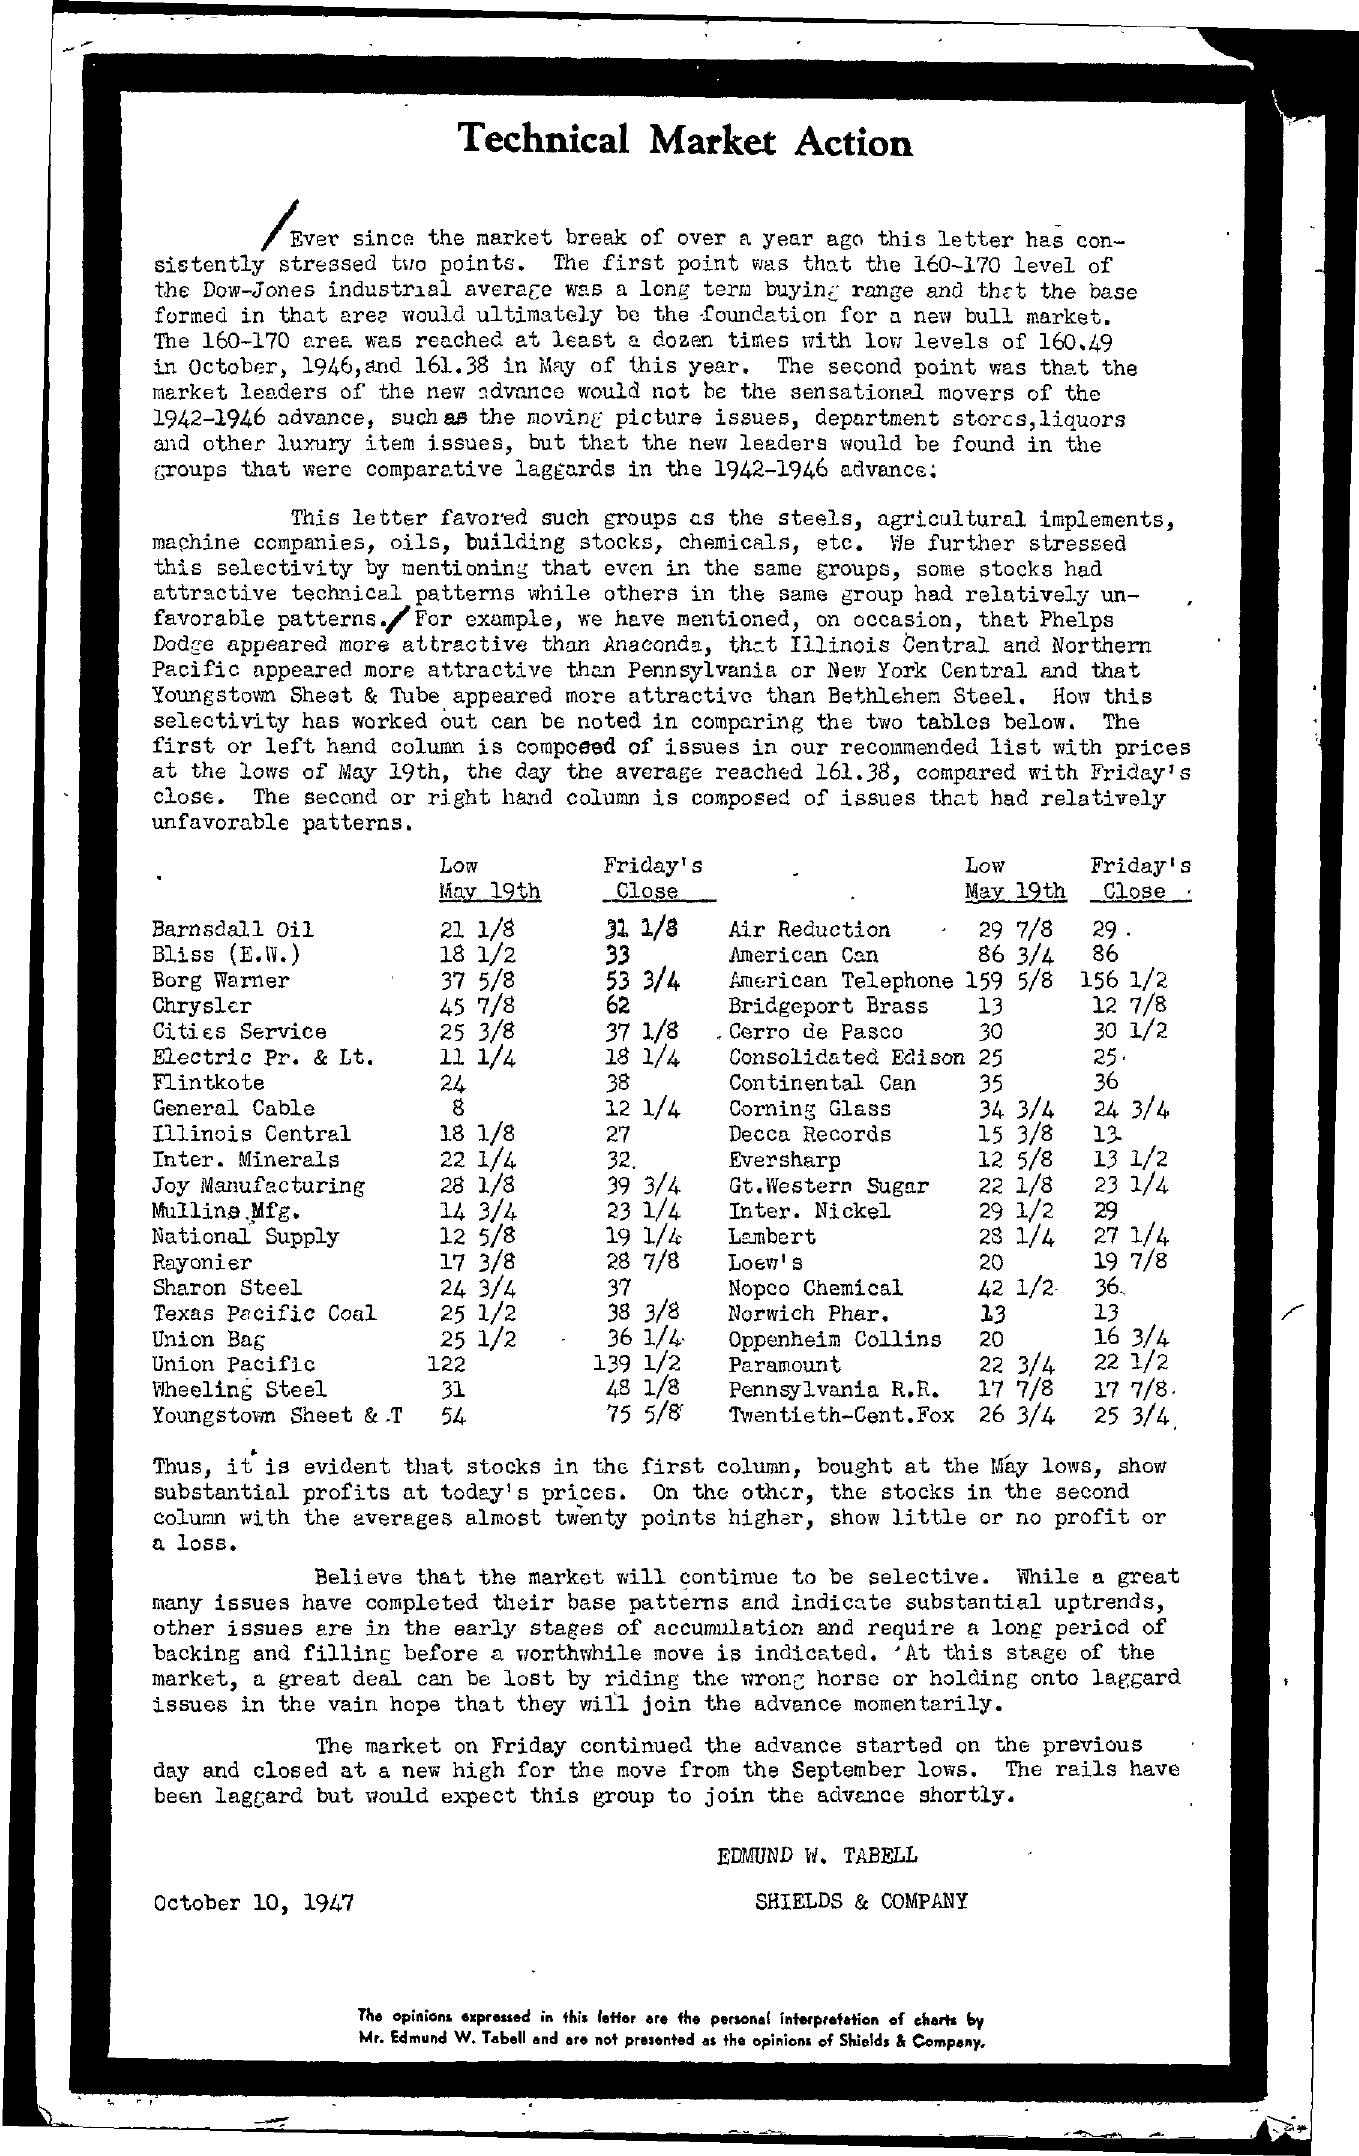 Tabell's Market Letter - October 10, 1947